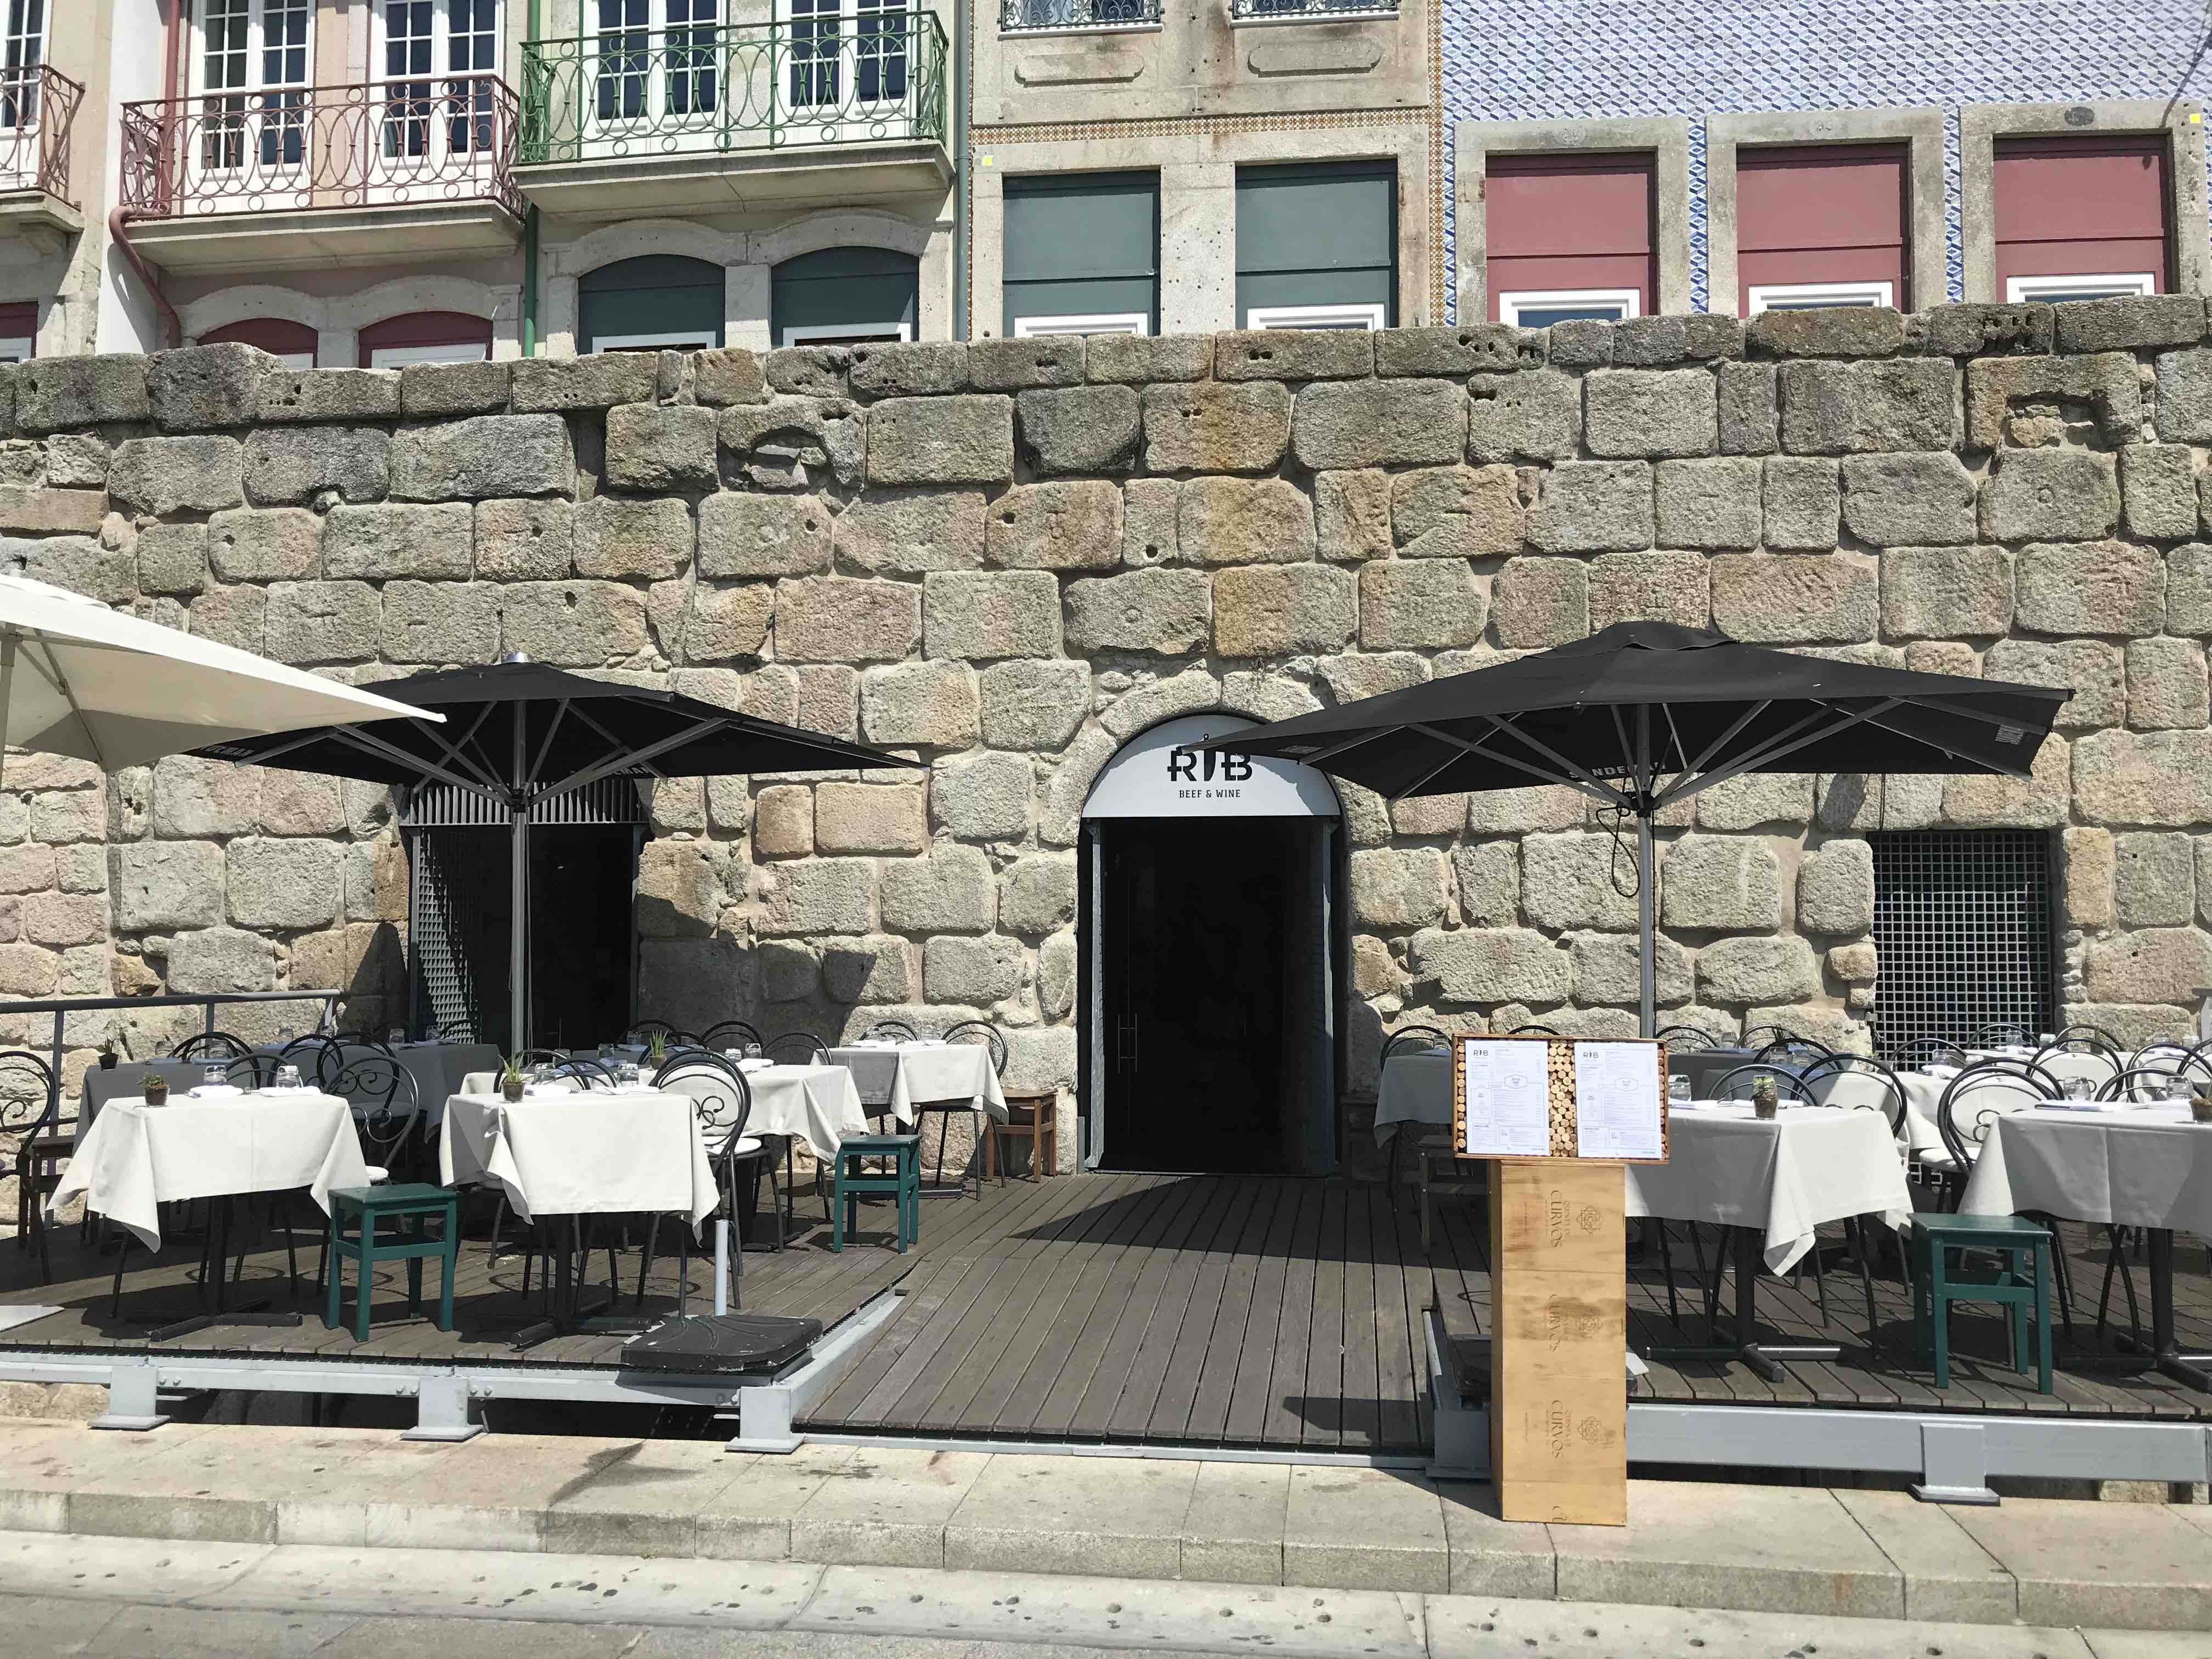 RIB Beef and Wine porto